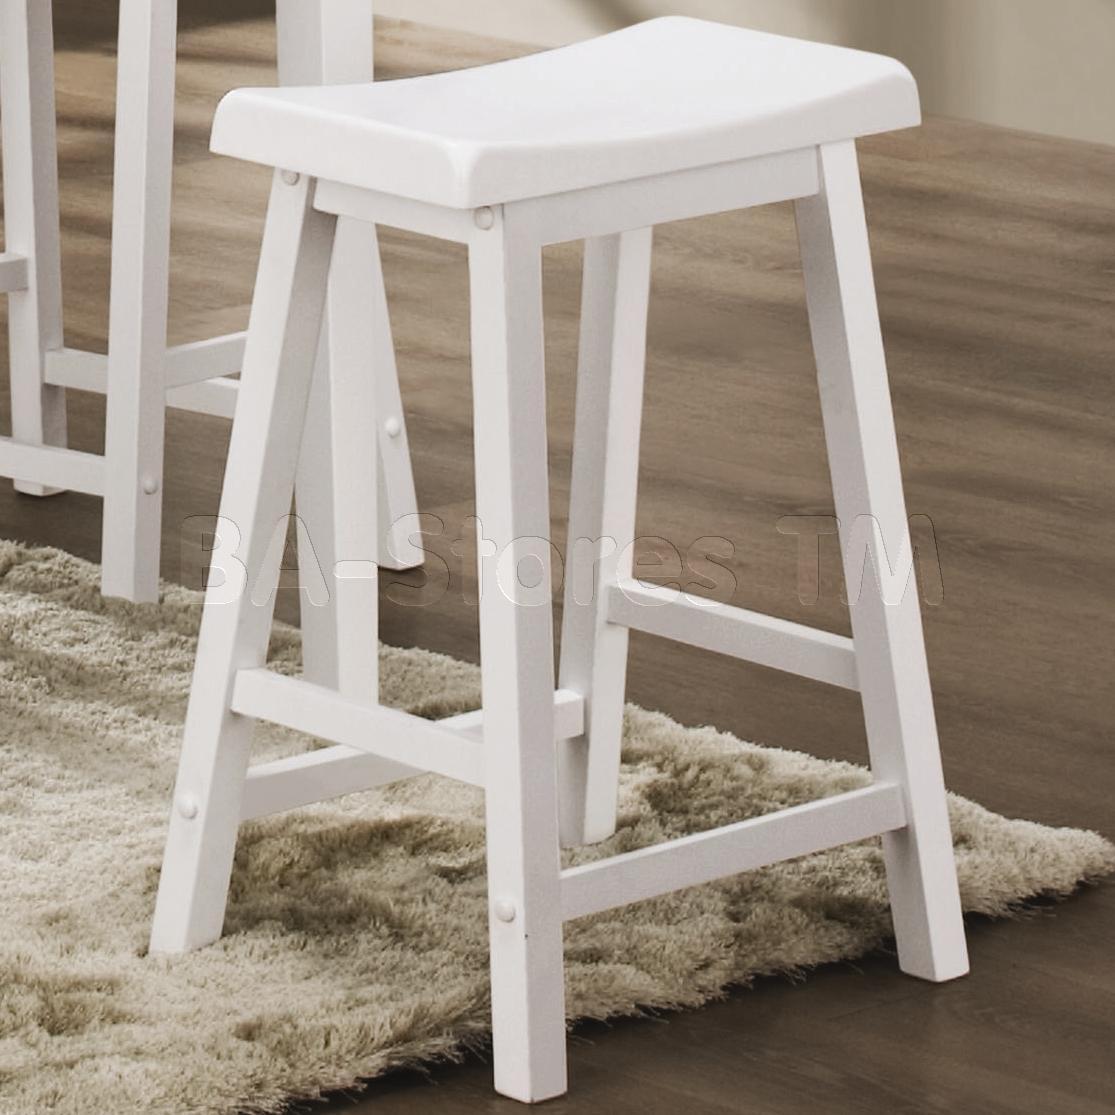 white wood bar stools White Wood Bar Stools   HomesFeed white wood bar stools